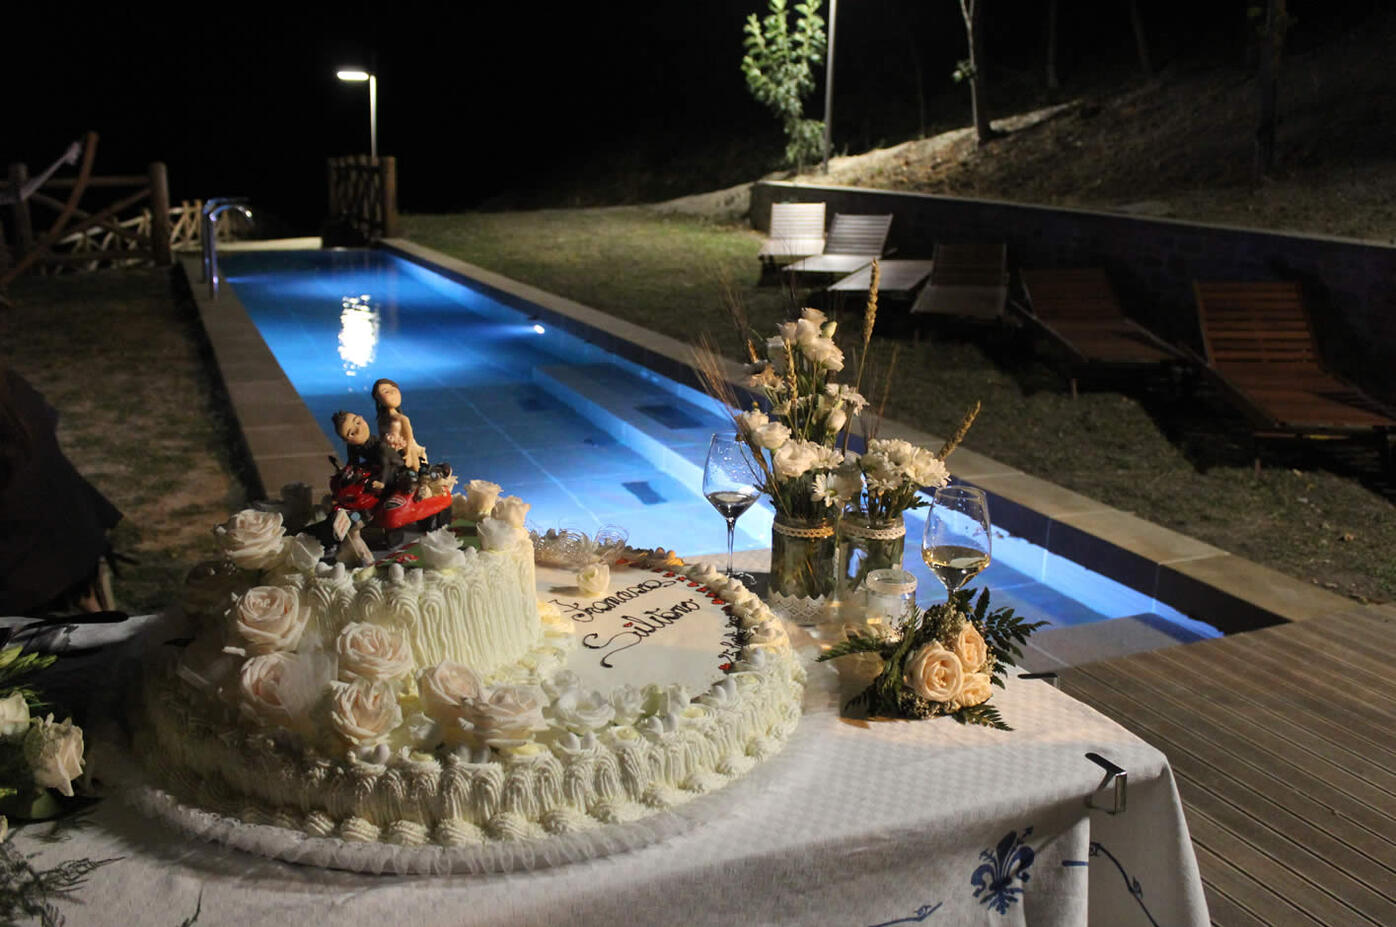 Matrimoni bagno di romagna agriturismo per cerimonie e ricevimenti forl cesena agriturismo - Bagno di romagna eventi ...